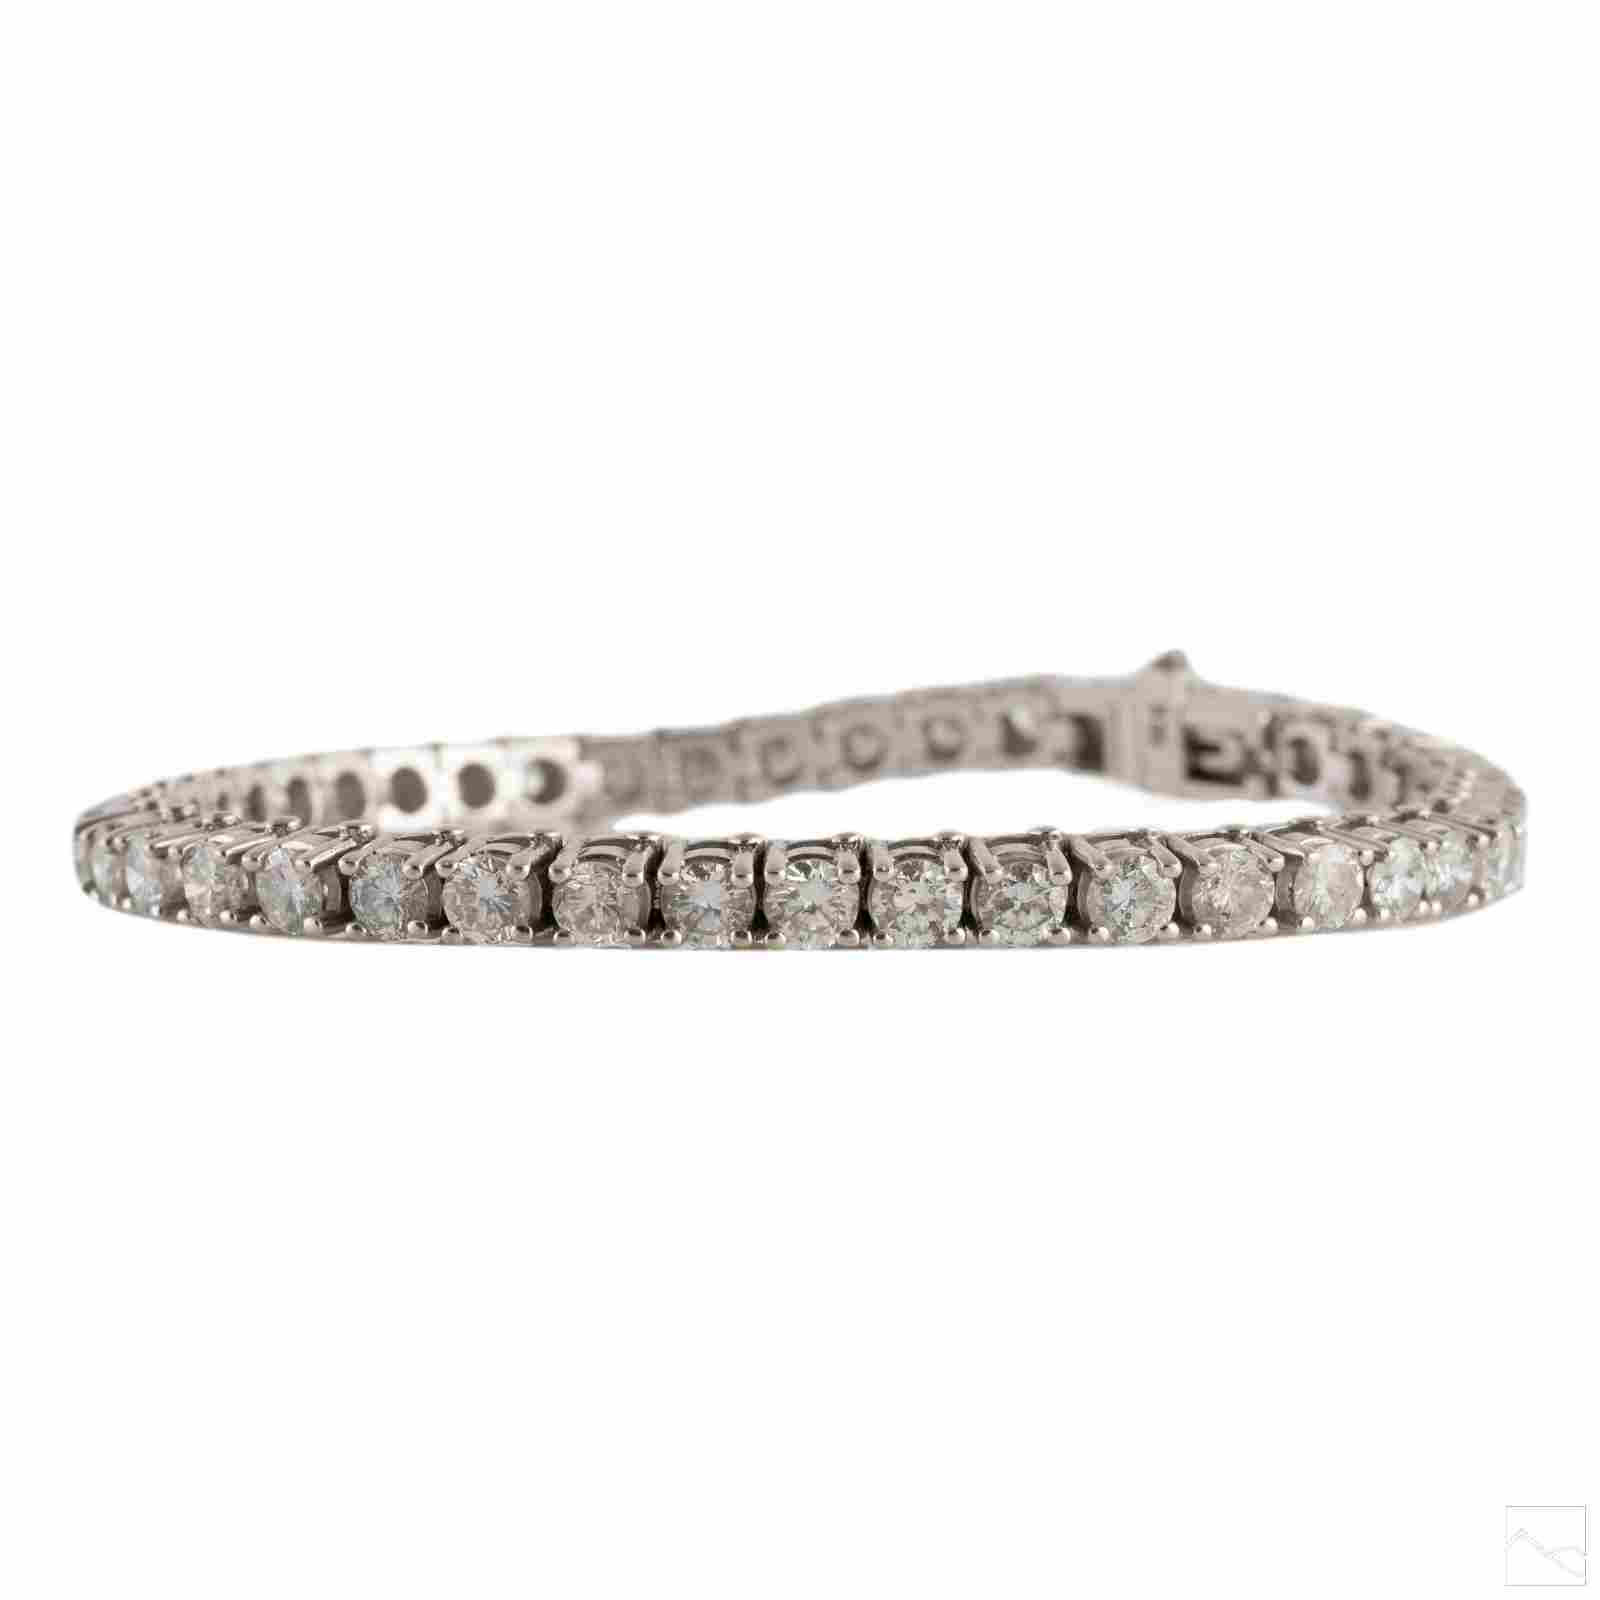 14K White Gold 7 CTTW Diamond Tennis Bracelet